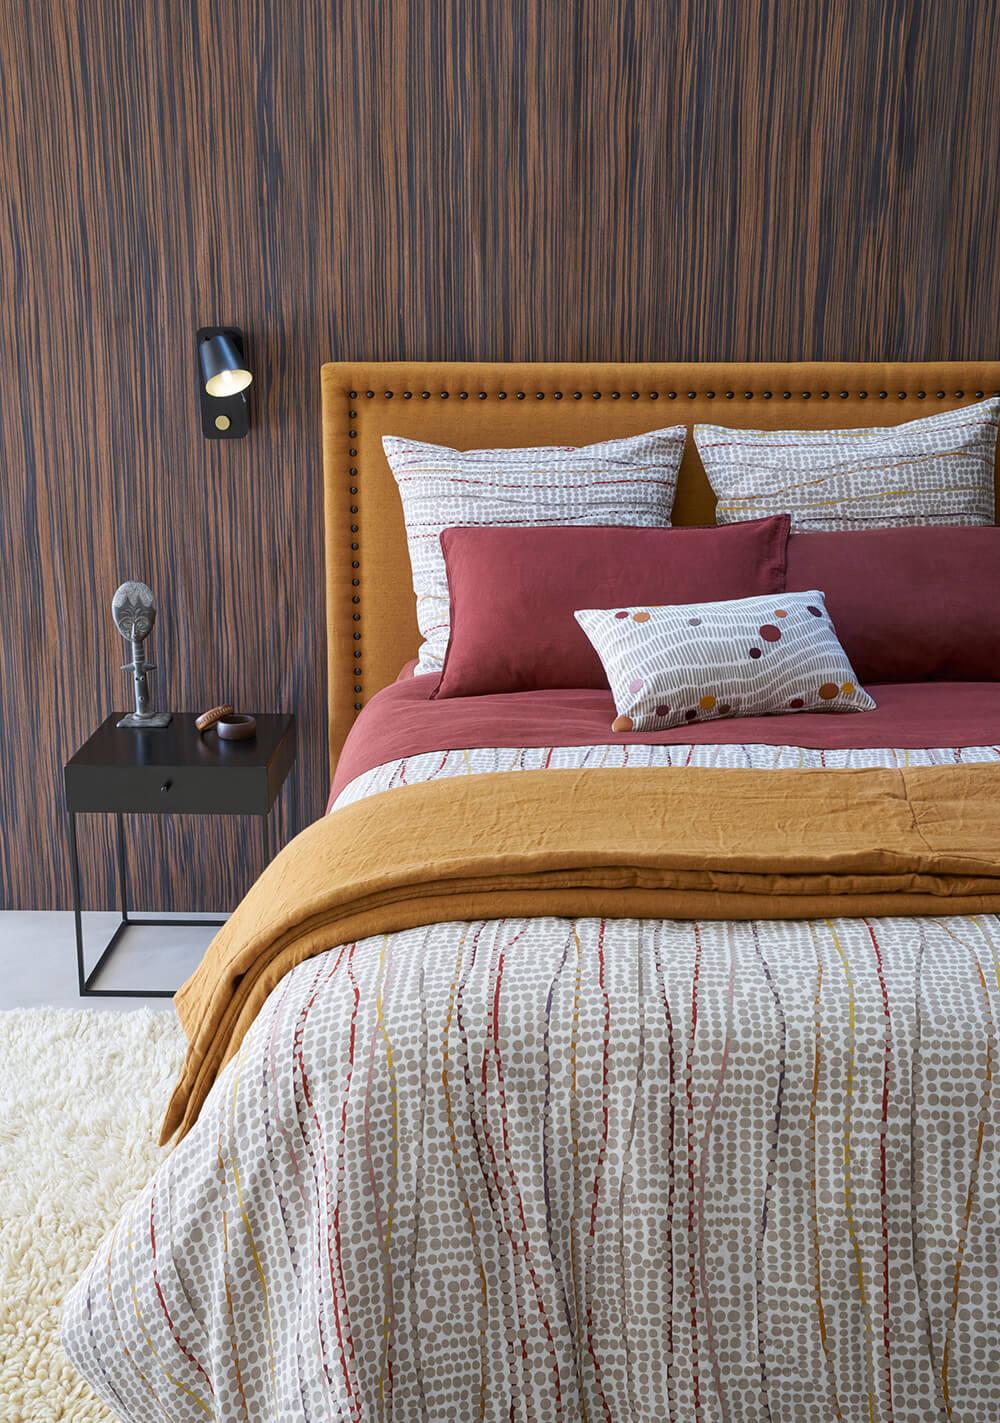 Tête de lit en lin